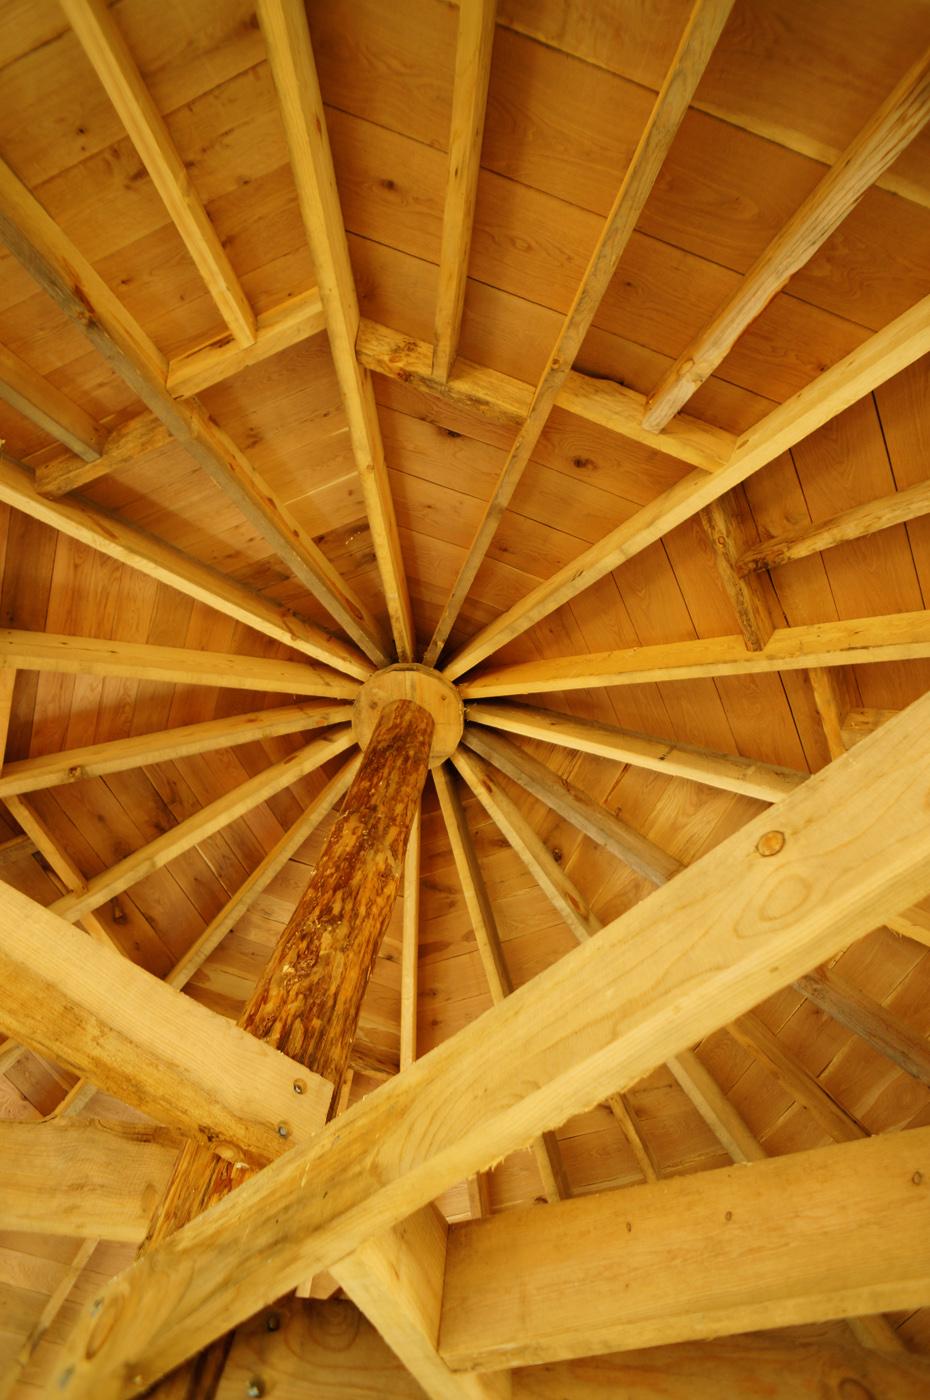 Sneak Peak Off Grid Straw Bale Cabin The Year Of Mud